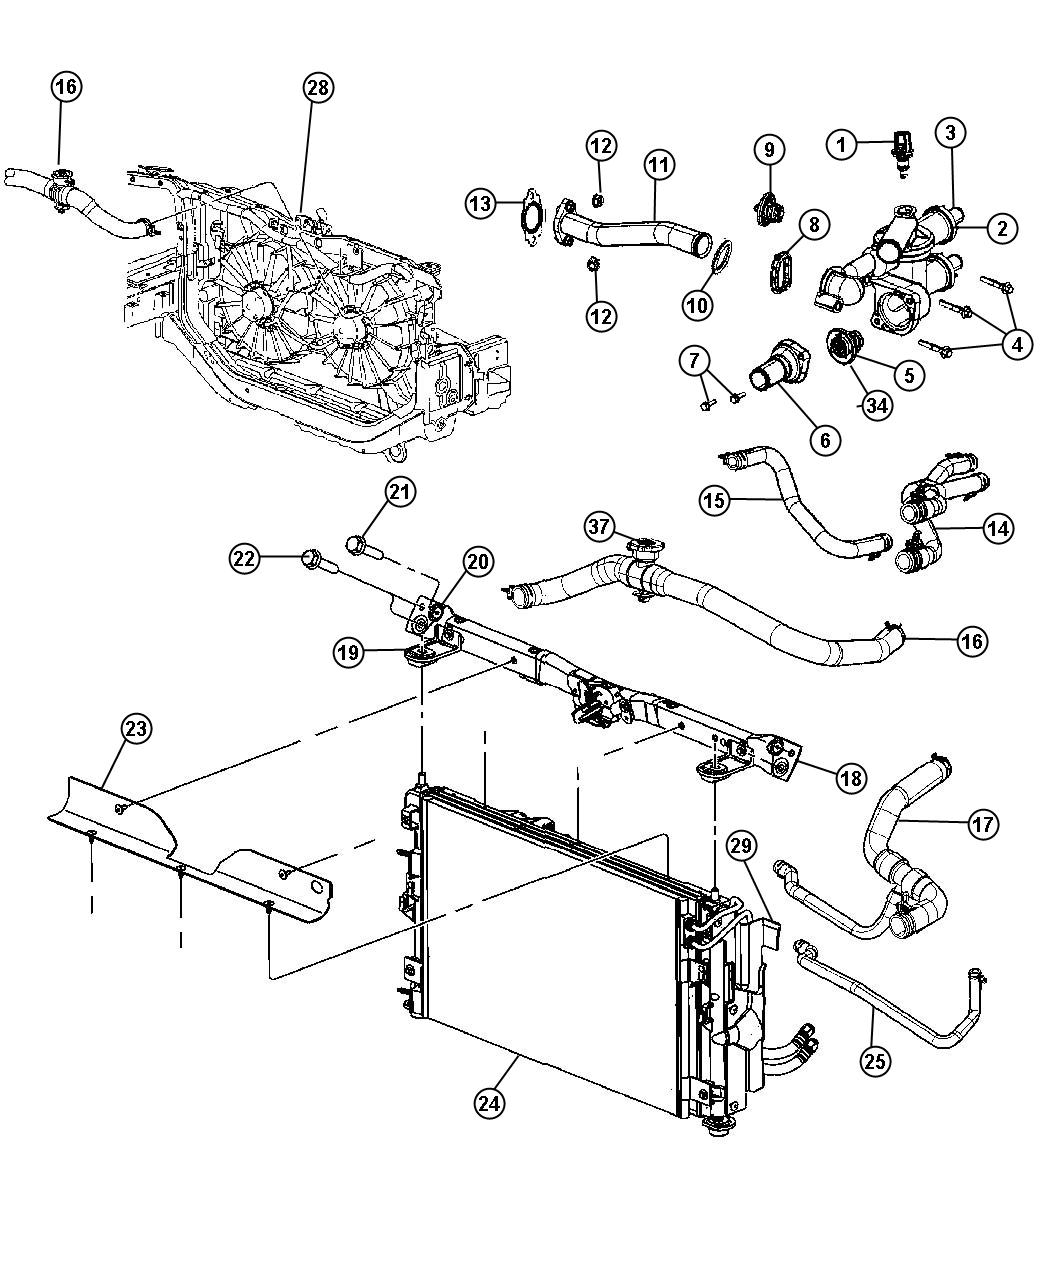 07 dodge caliber headlight wiring diagram air suspension starter diagrams durango radio